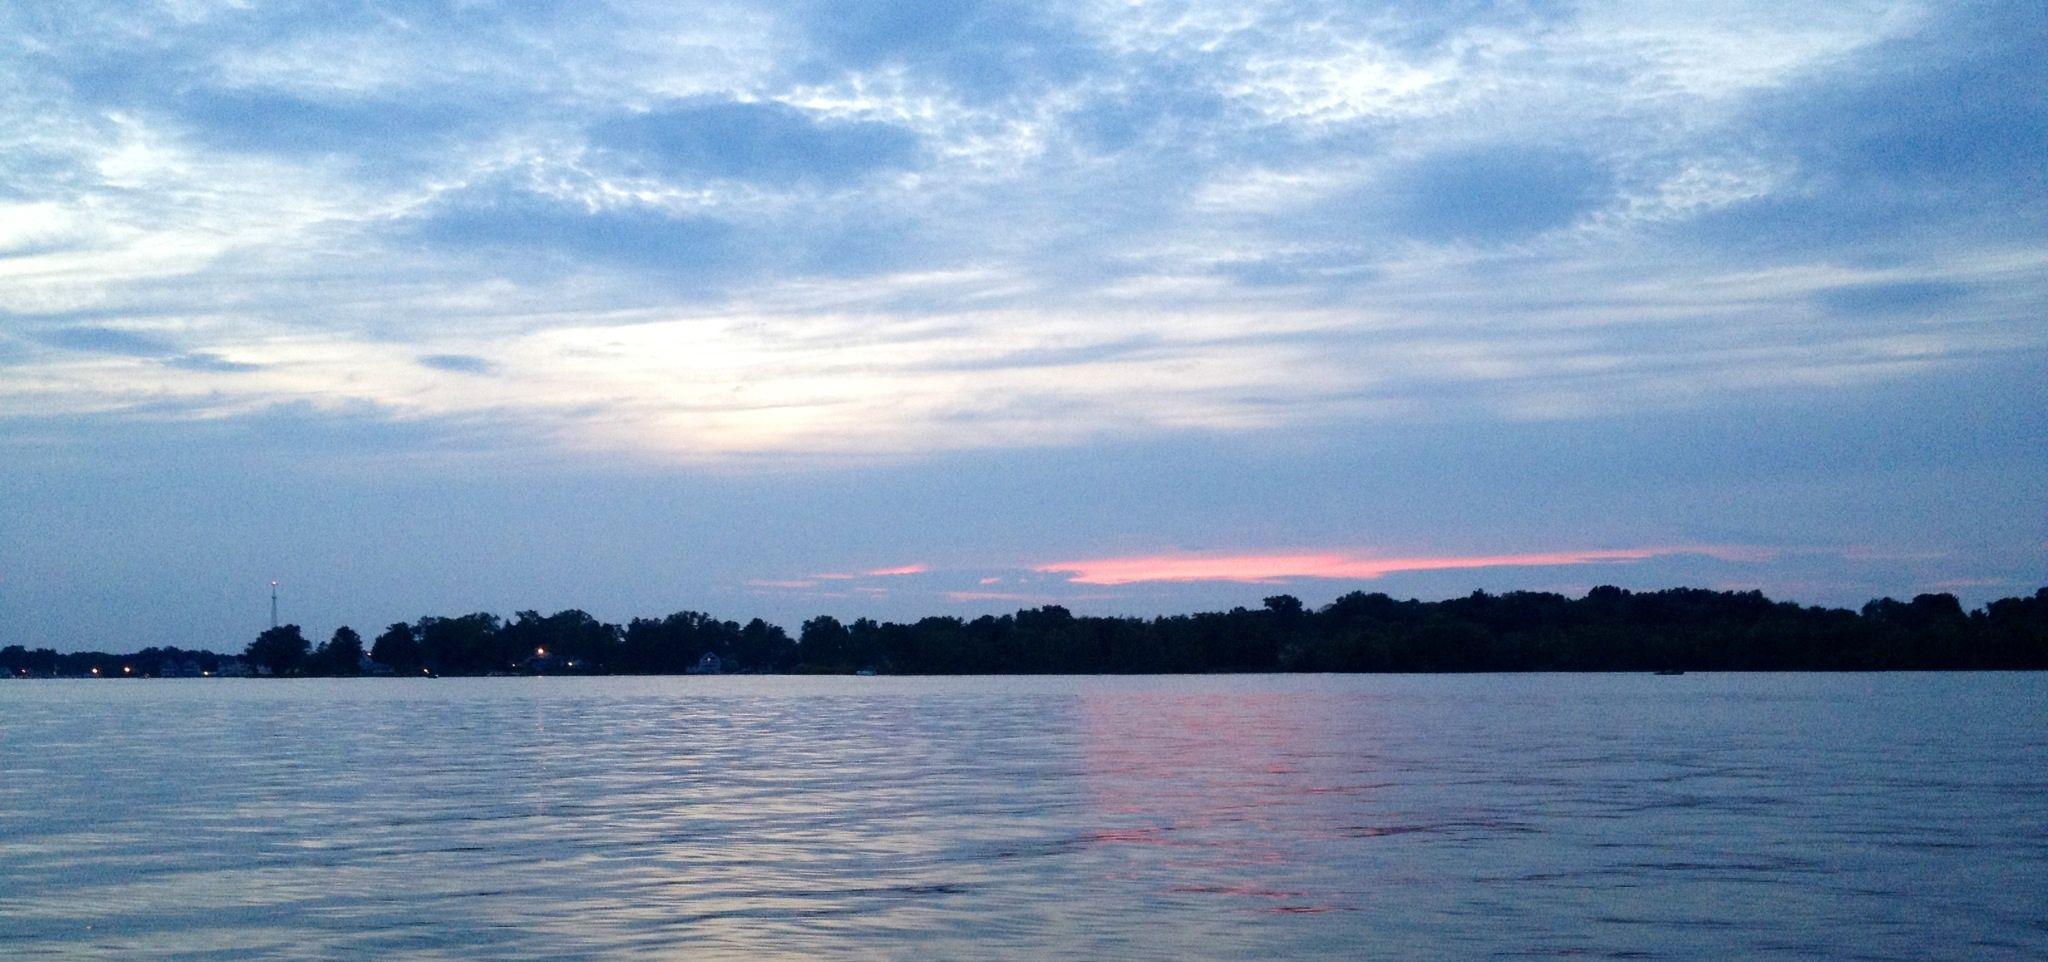 Buckeye lake at its best buckeye lake natural